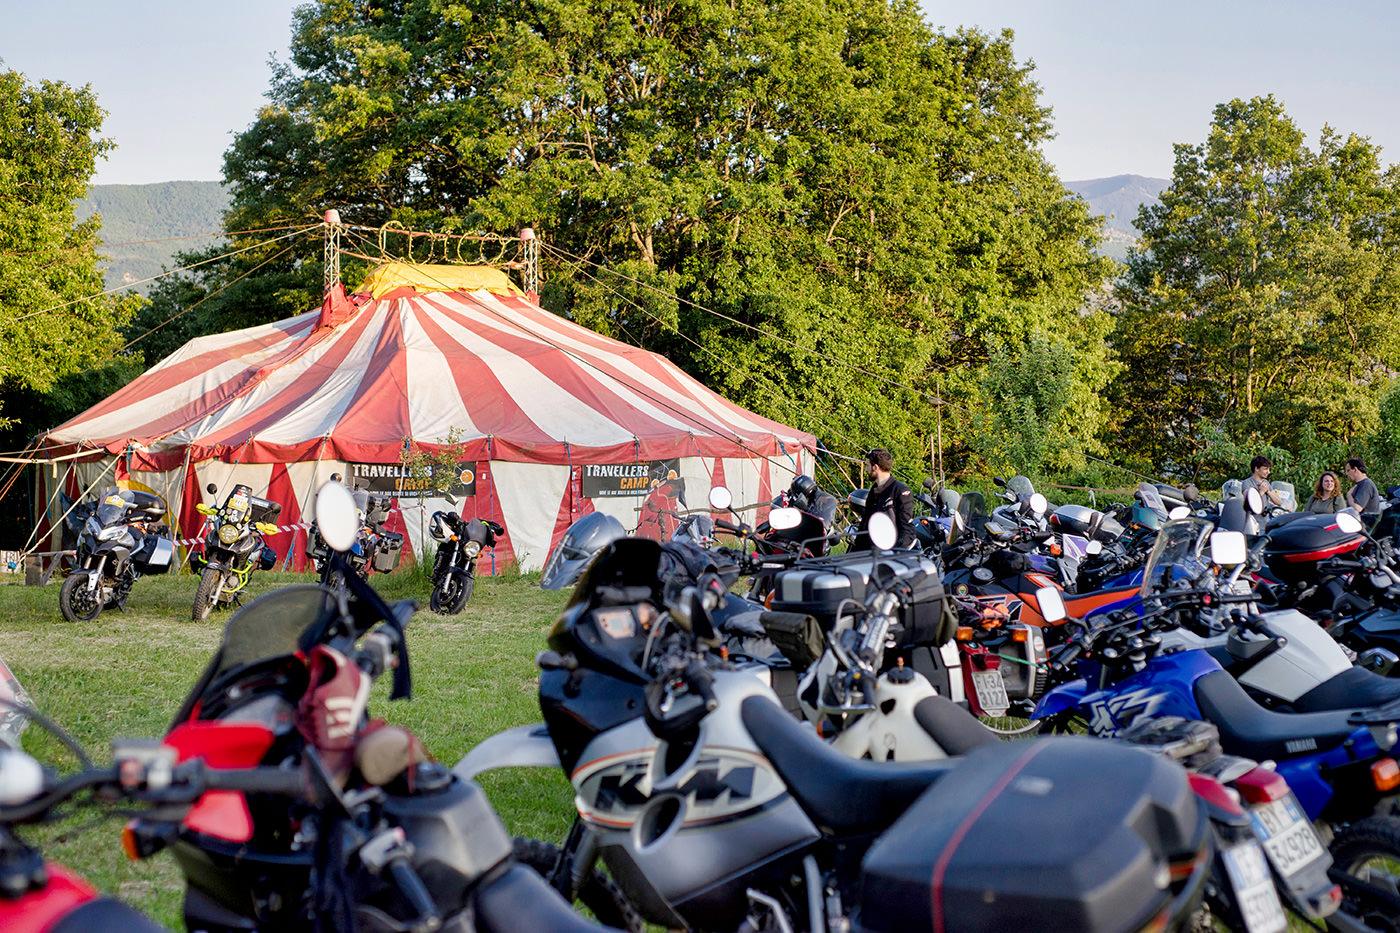 Travellers Camp 2018 per moto viaggiatori